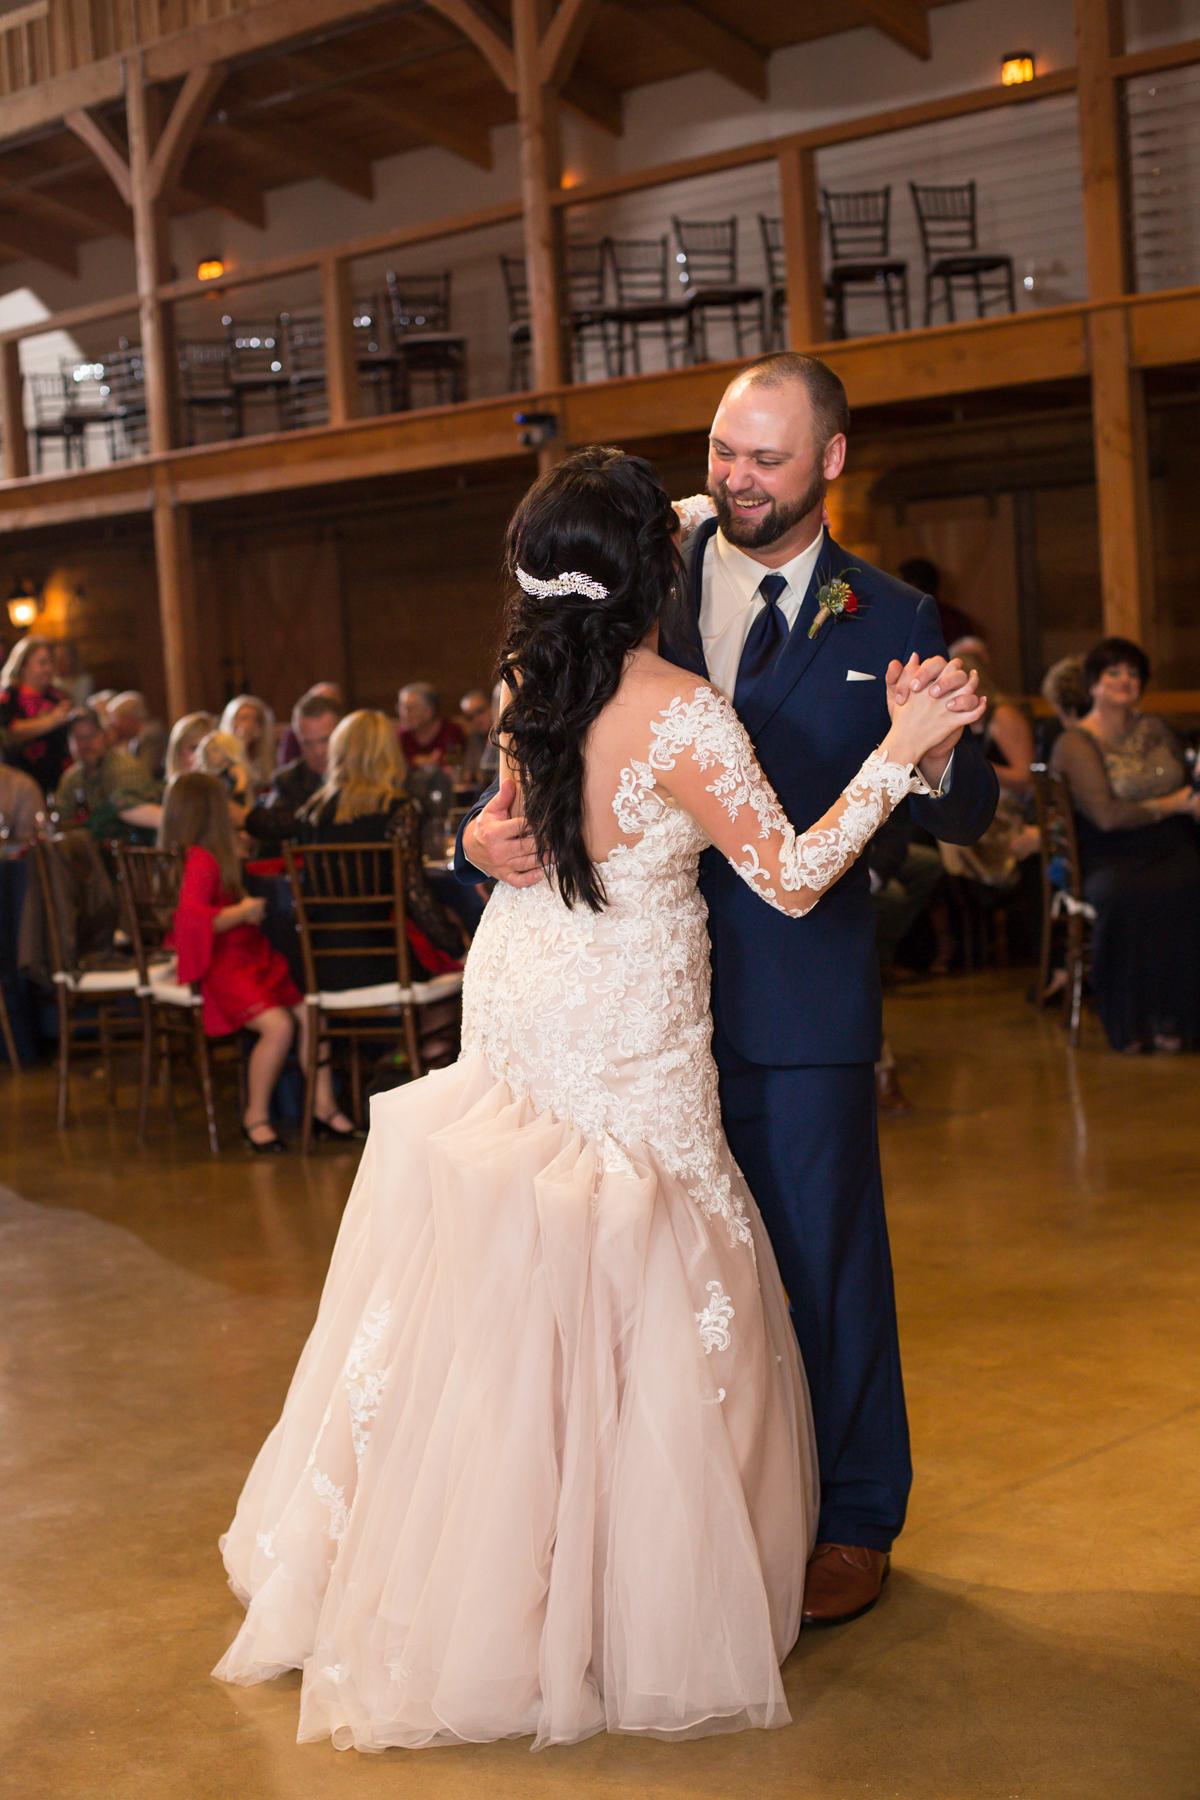 The-Barn-at-Sycamore-Farms-wedding-Shawn-and-Hayden-0369.jpg